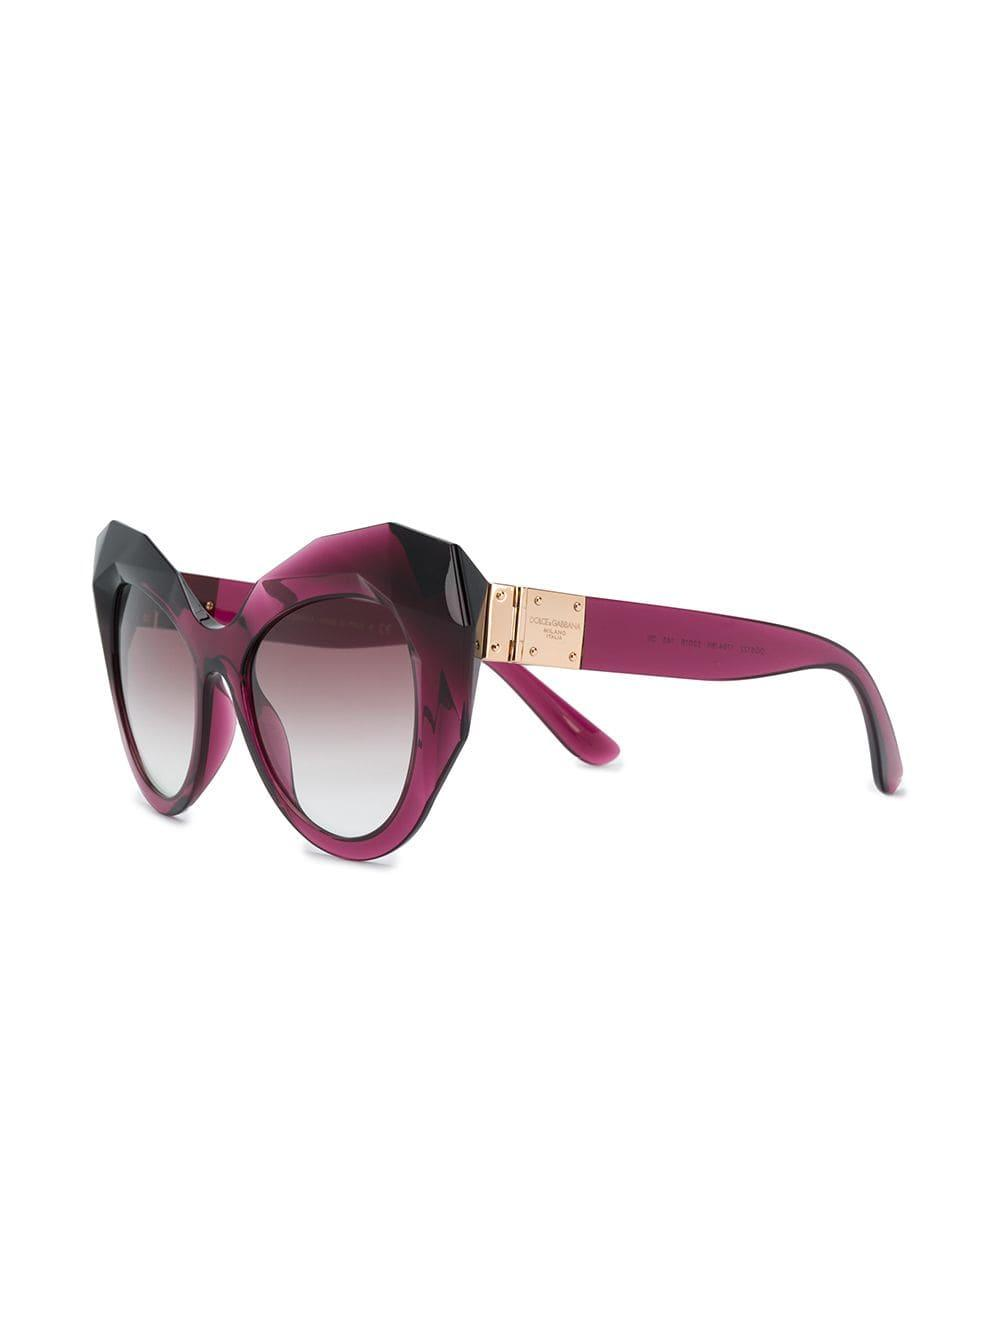 6e27867f0236 Lyst - Dolce   Gabbana Oversized Cat Eye Sunglasses in Pink